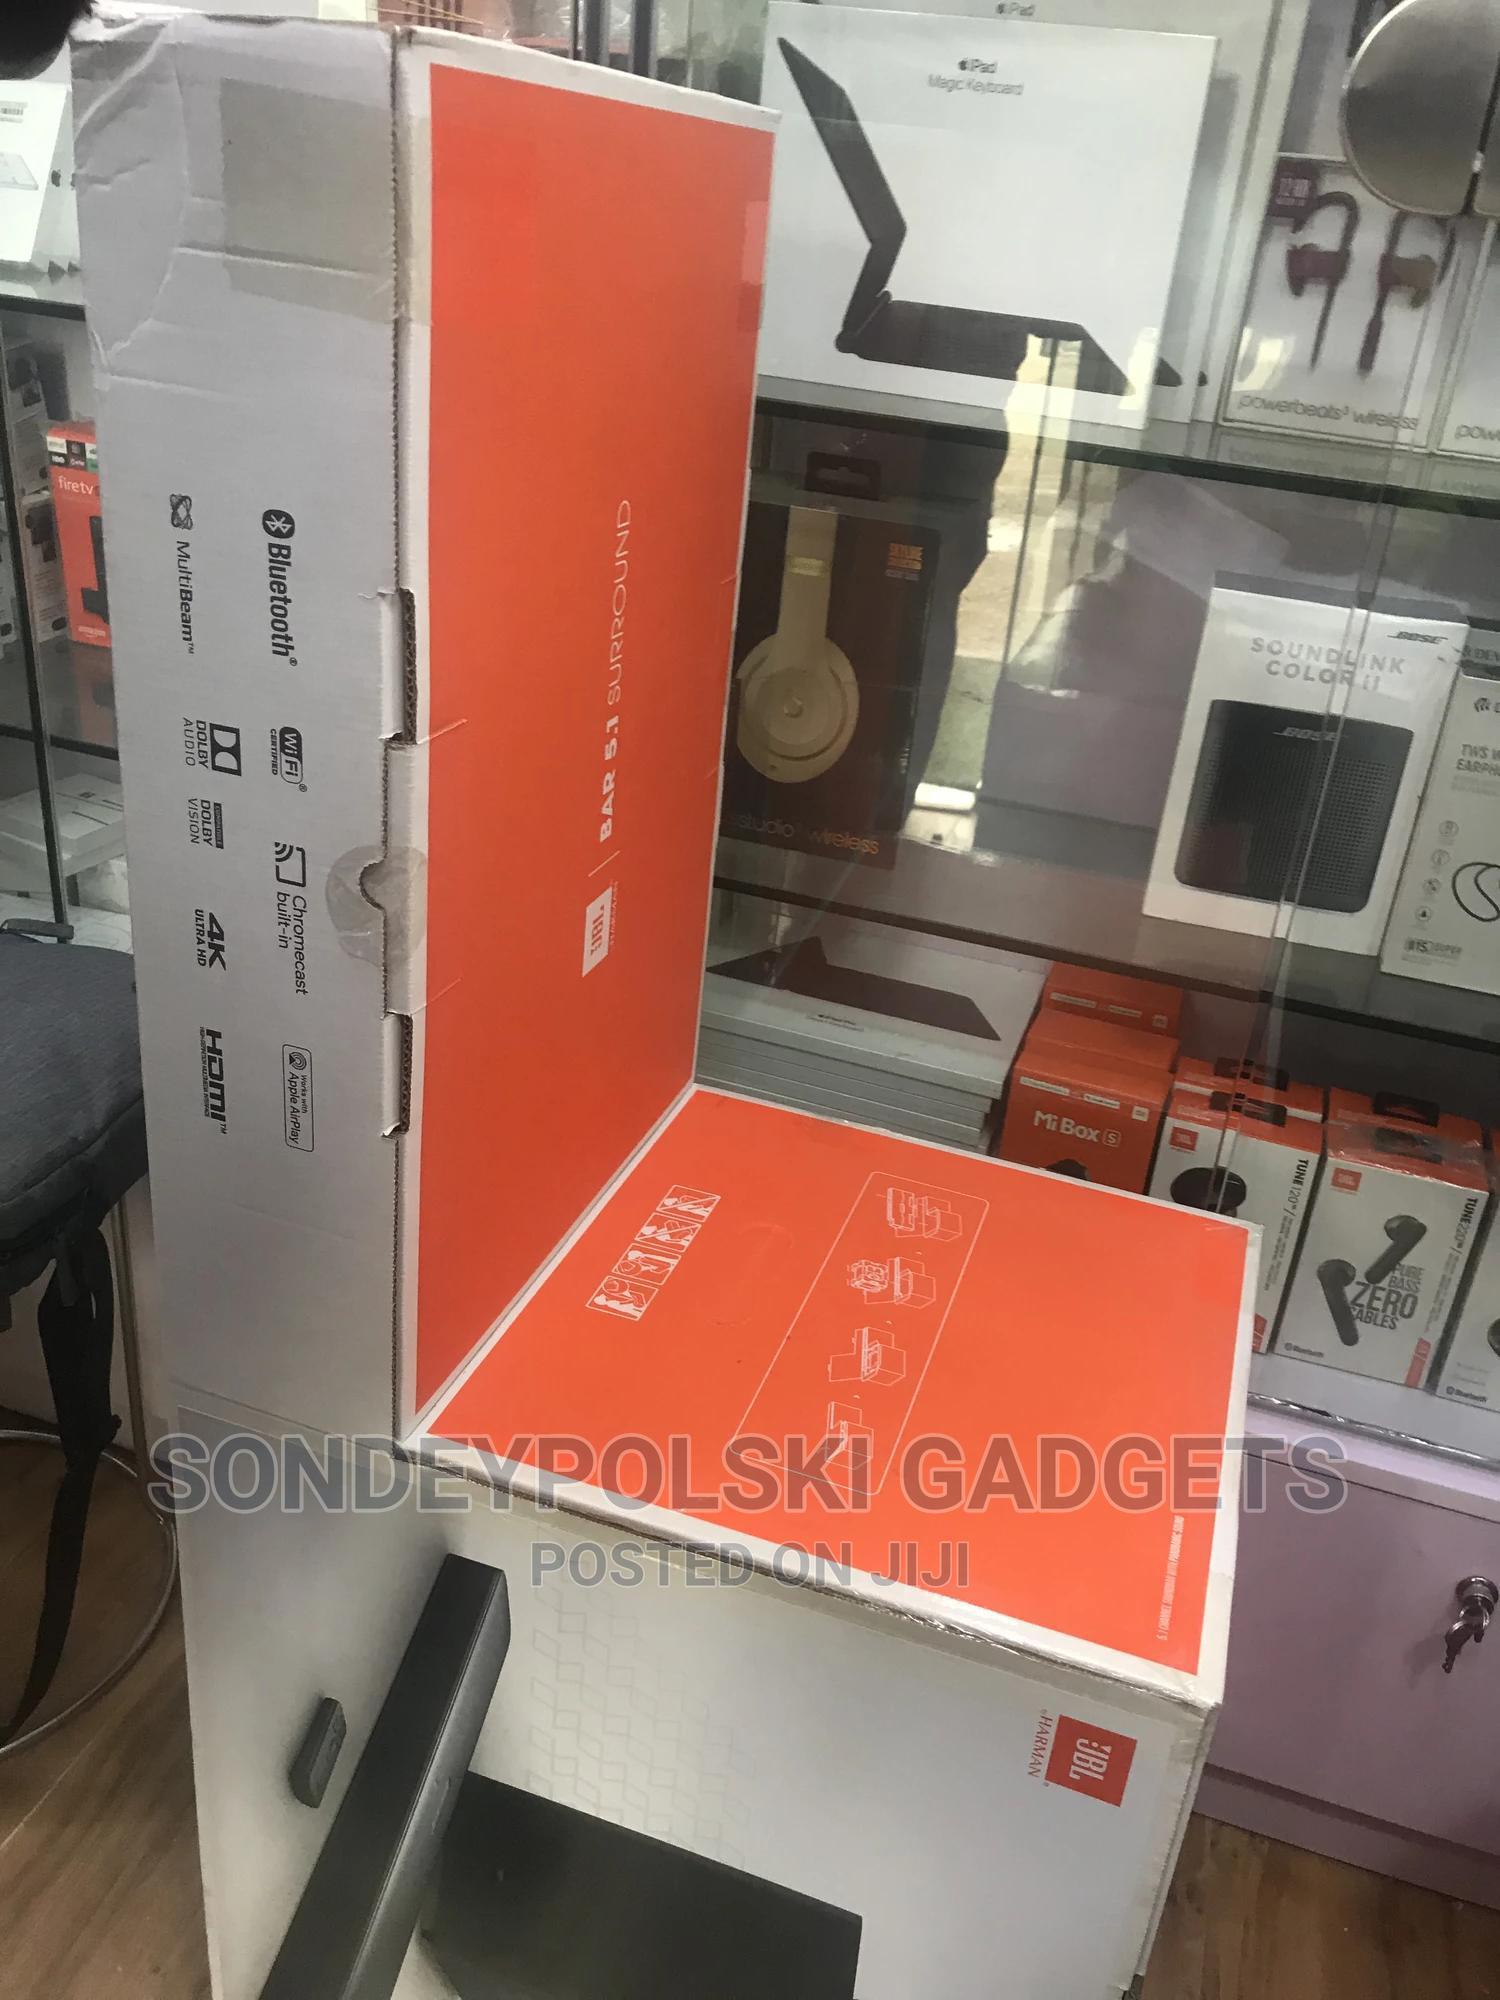 JBL 510w Bar 5.1 - Channel 4k Ultra HD Surround Soundbar | Audio & Music Equipment for sale in Ikeja, Lagos State, Nigeria